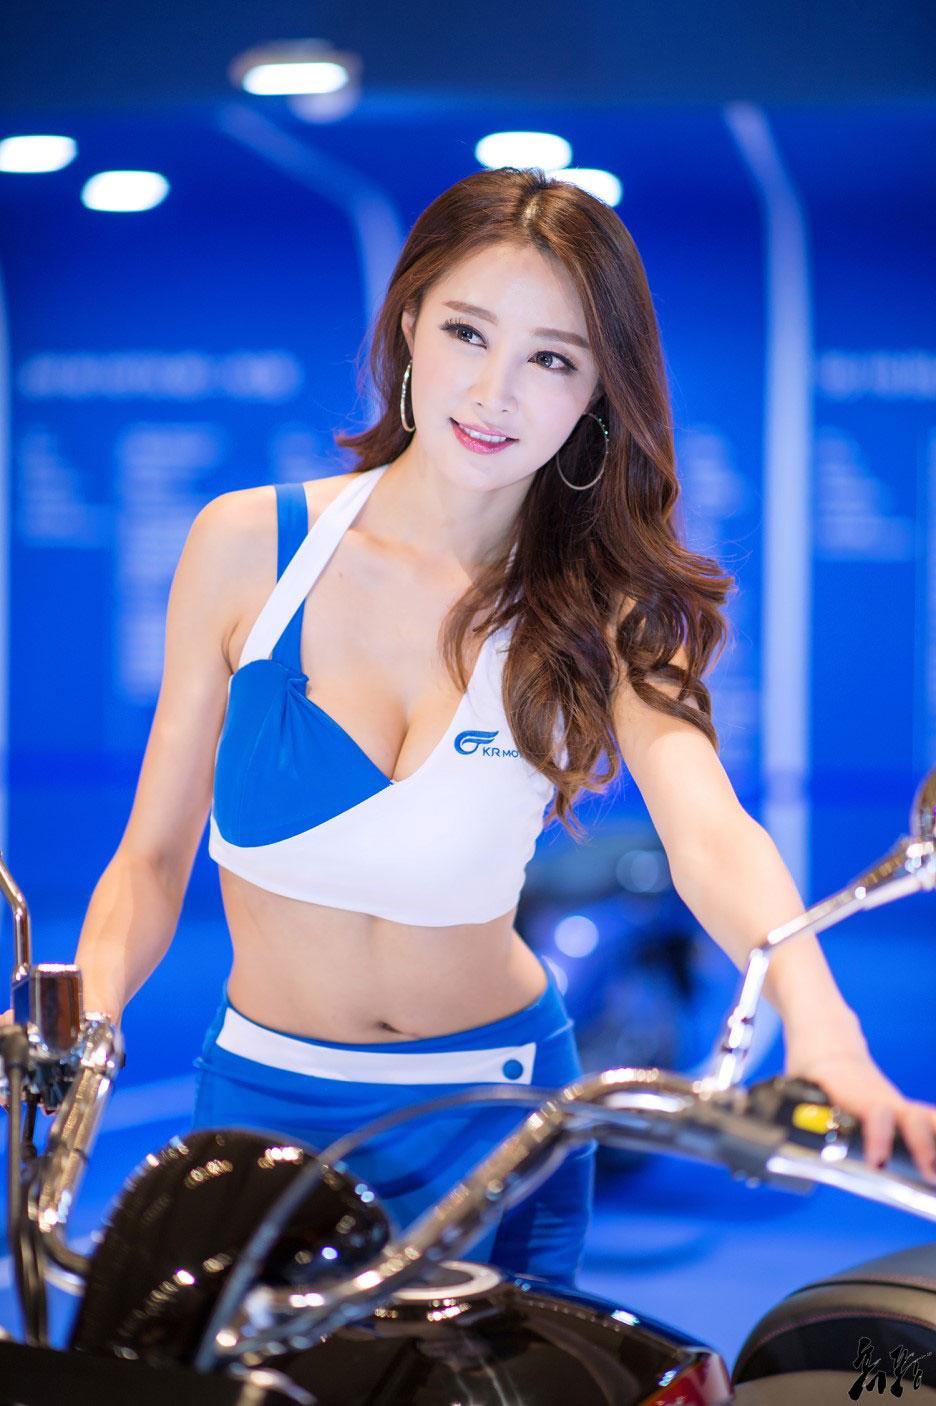 Eun Bin Seoul Motorcycle Show 2016 KR Motors